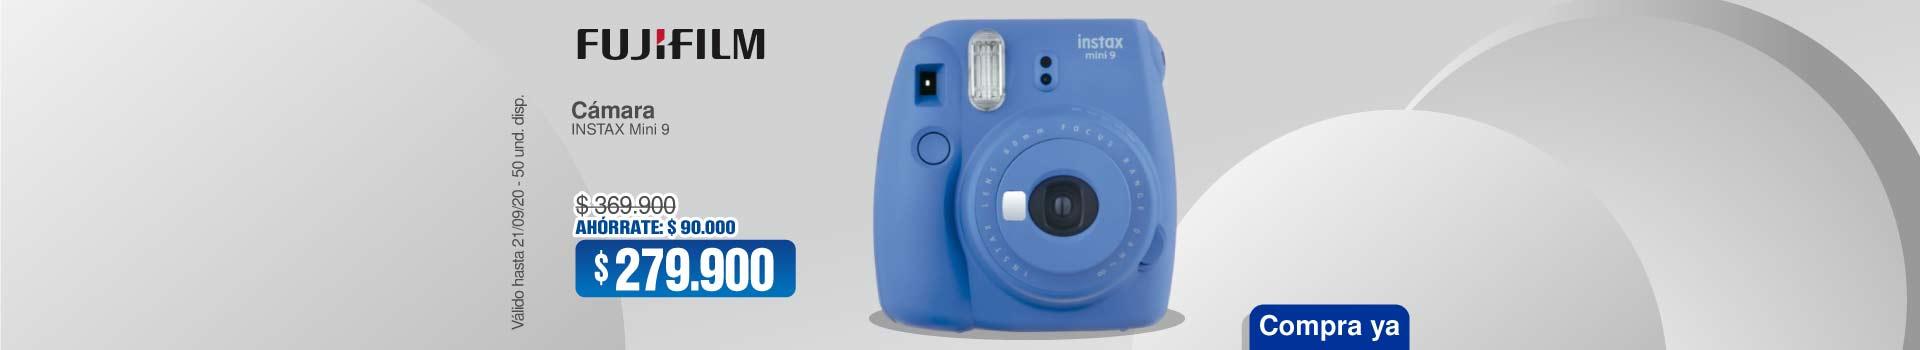 HiperOfertas_CamarasCámara-FUJIFILM-INSTAX-Mini-9-Azul-Cobalto44095